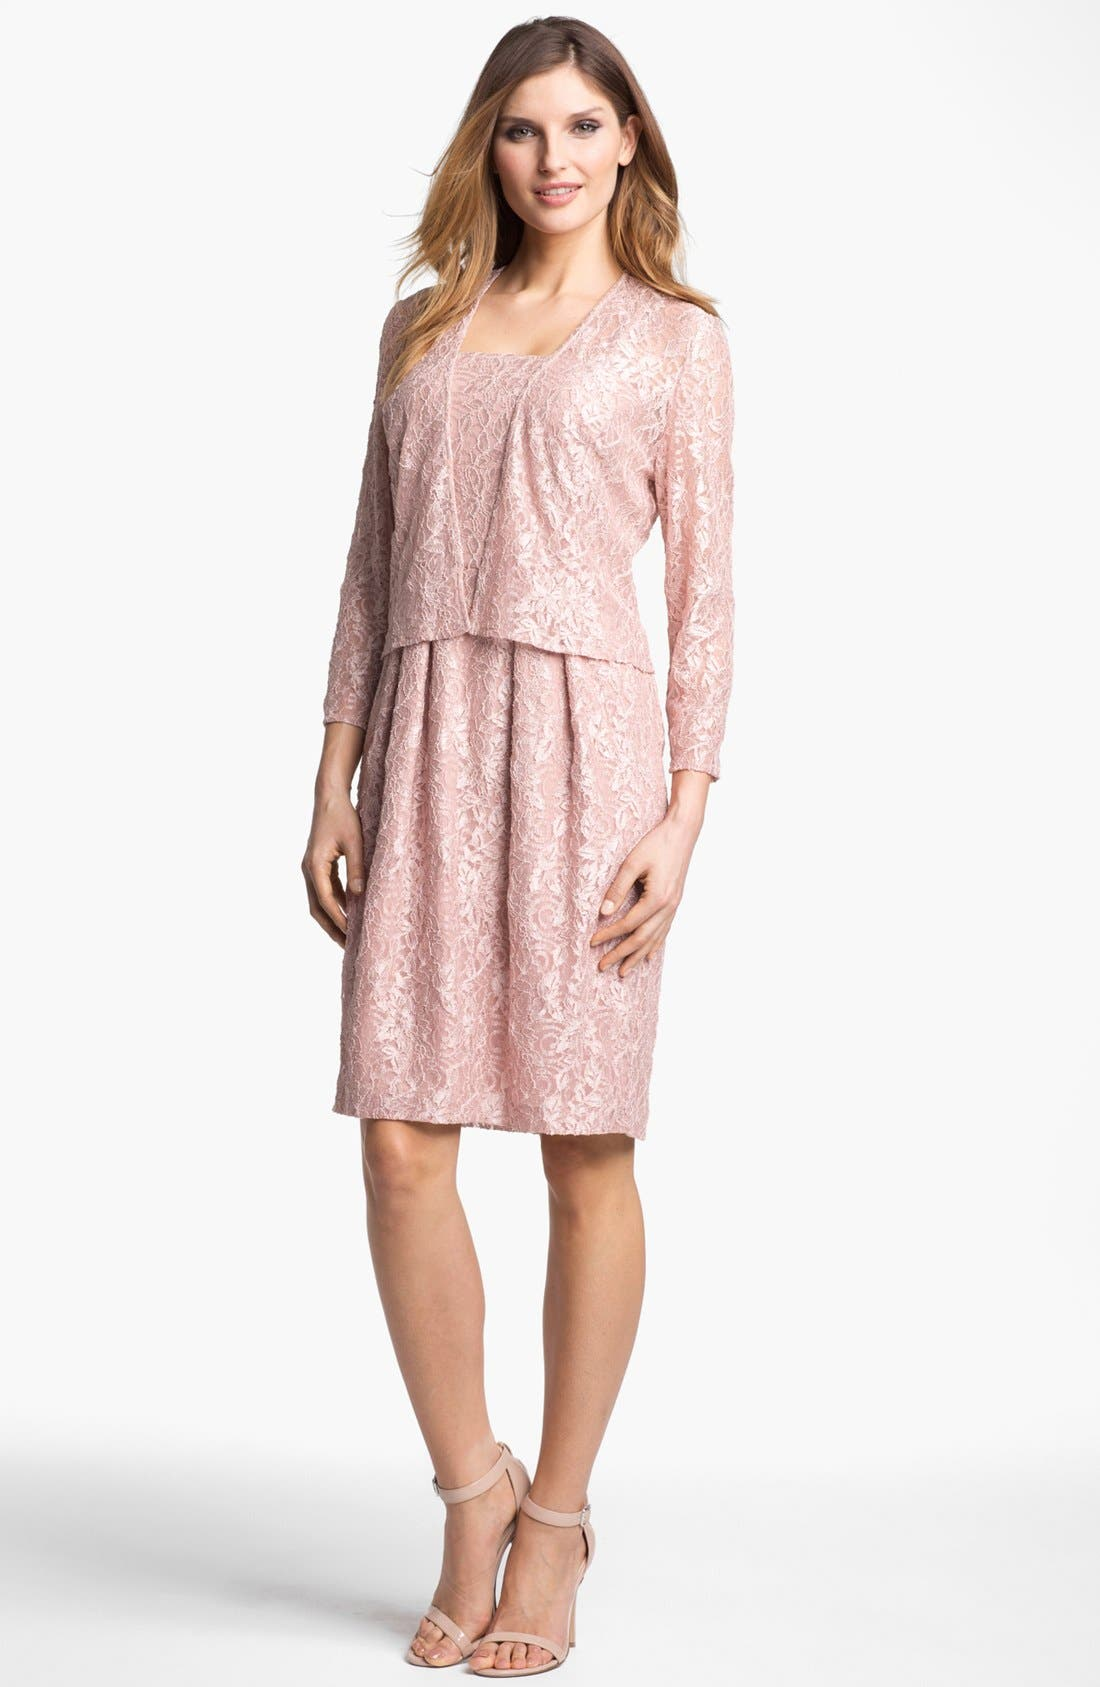 Main Image - Alex Evenings Lace Dress & Jacket